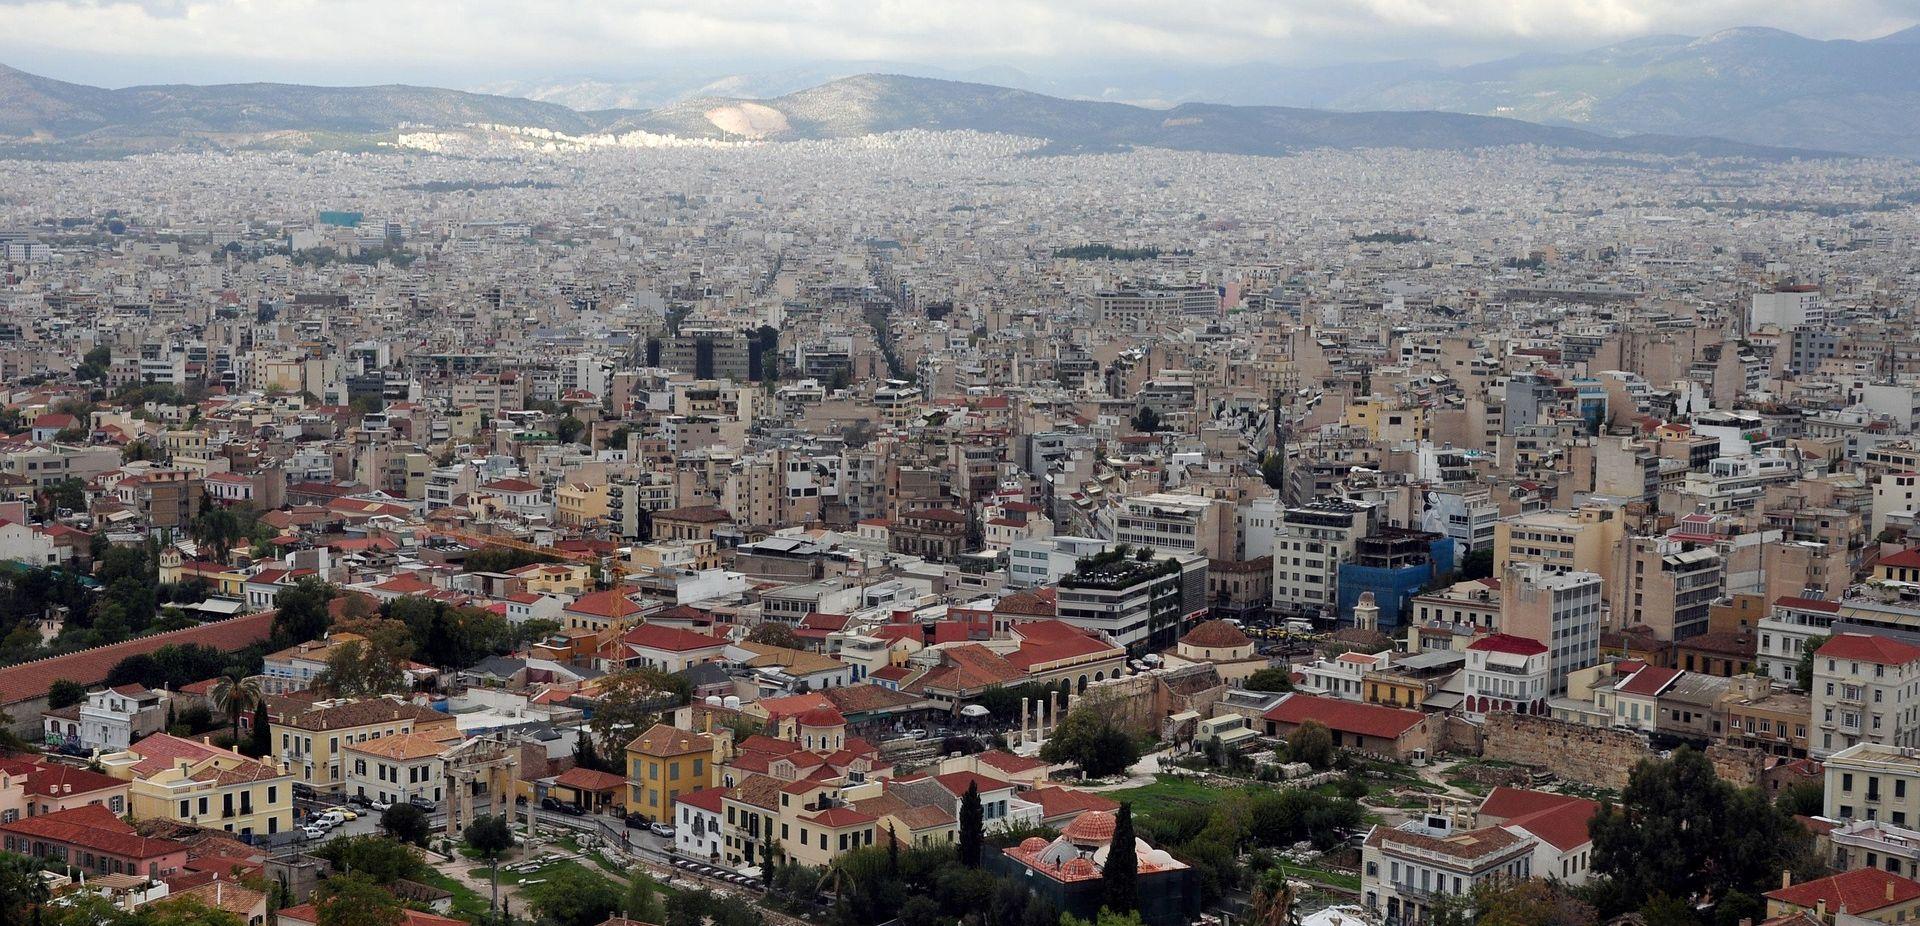 Potres magnitude 4,1 pogodio Atenu